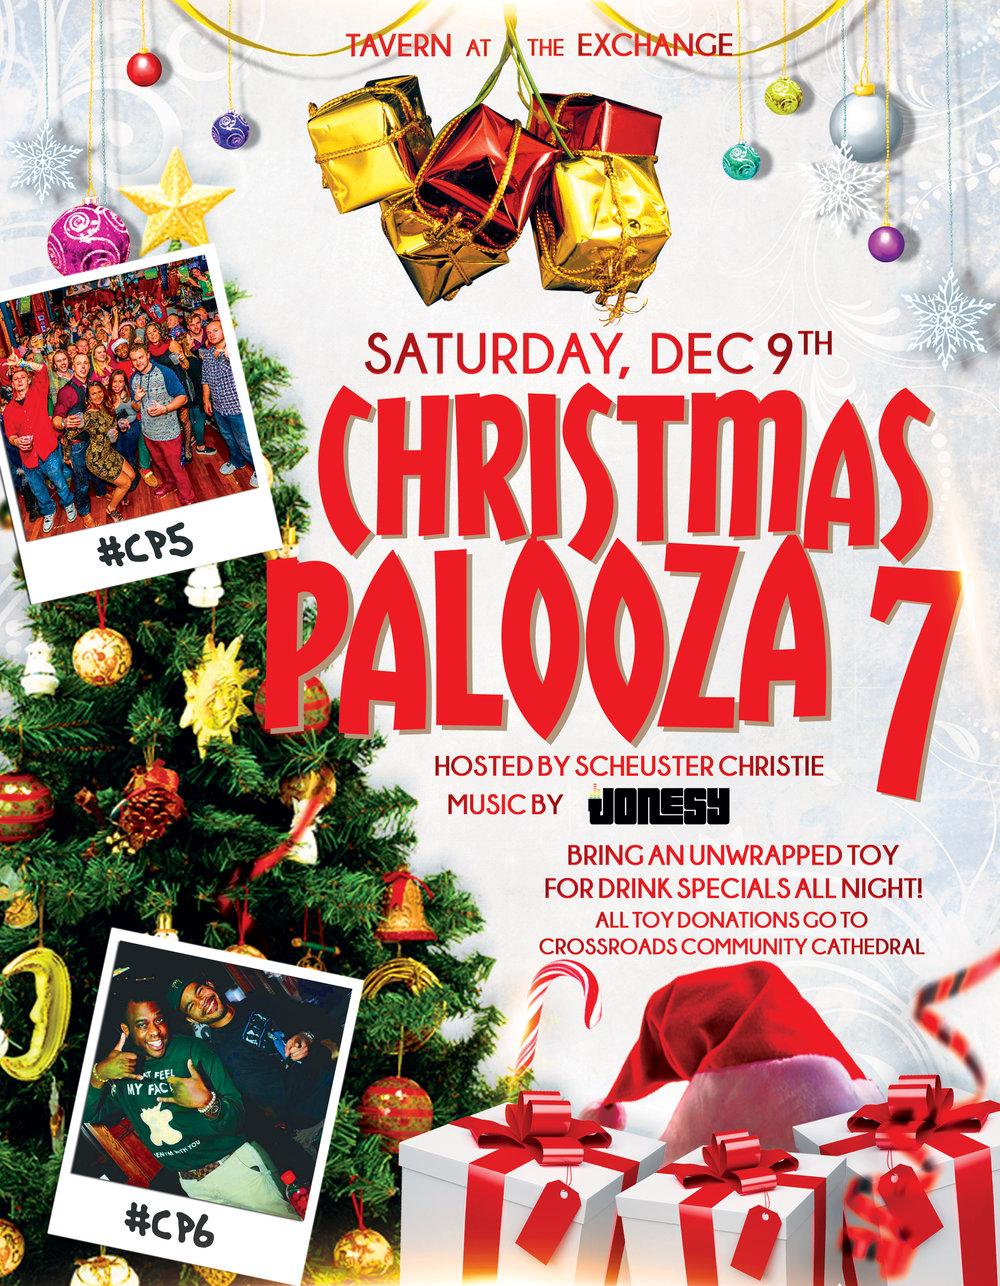 ChristmasPalooza7-TavernattheExchange.jpg